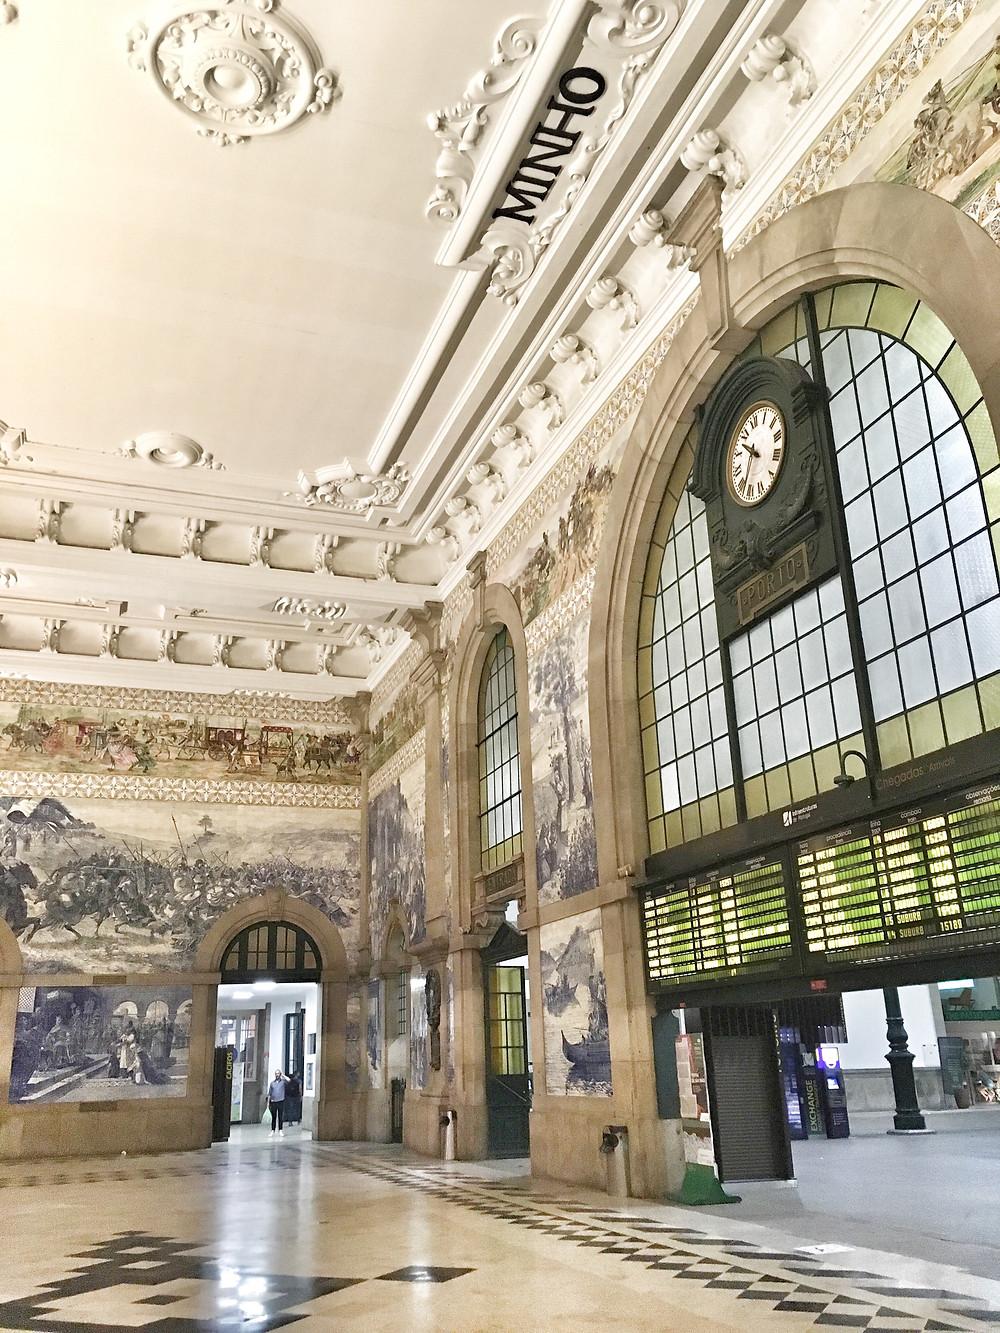 São Bento Train Station in Porto